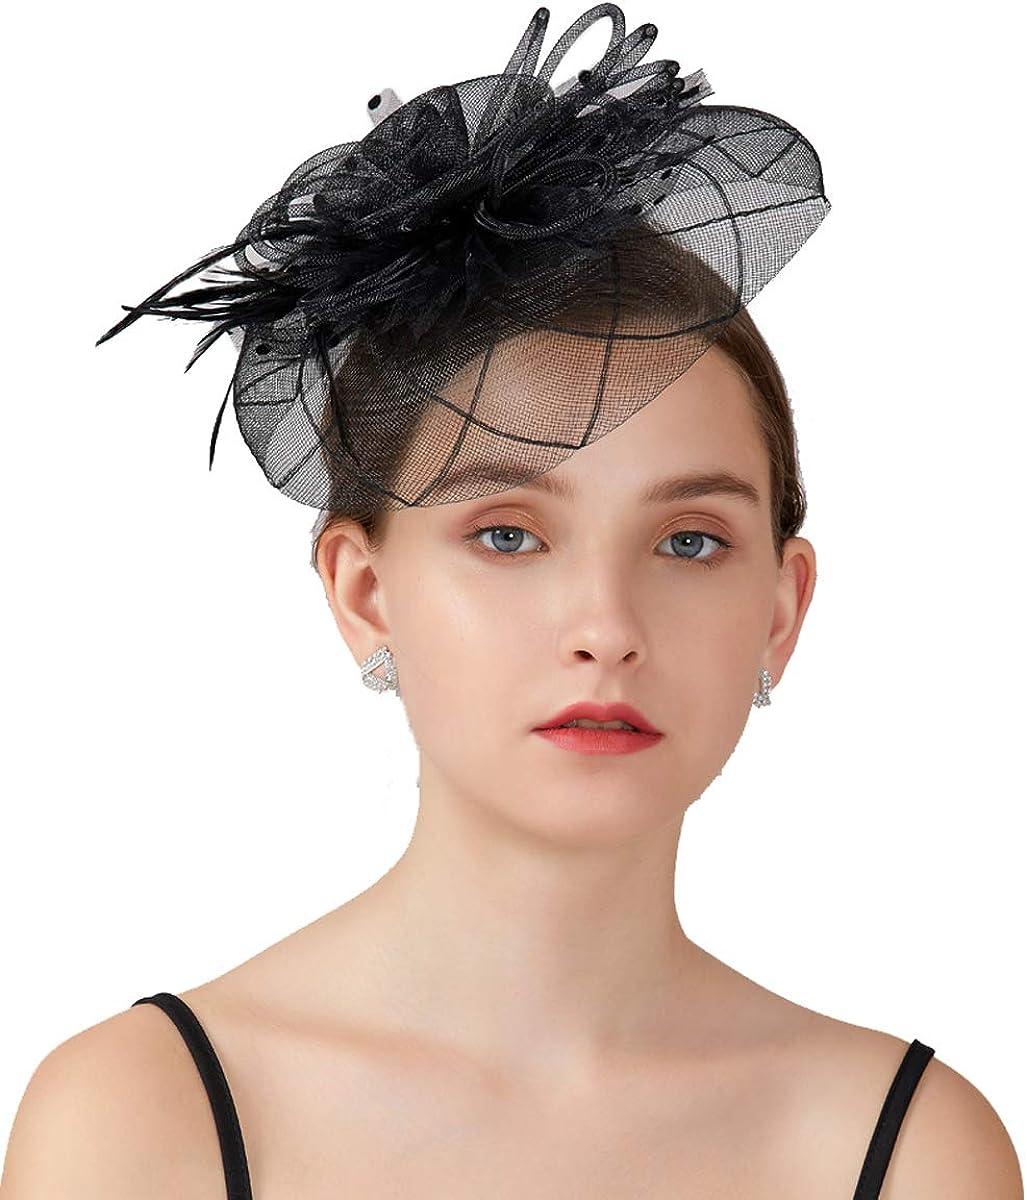 JISEN Women Vintage Fascinators Hat Tea Popular shop is the lowest price challenge Net Derby Feather Seattle Mall Party